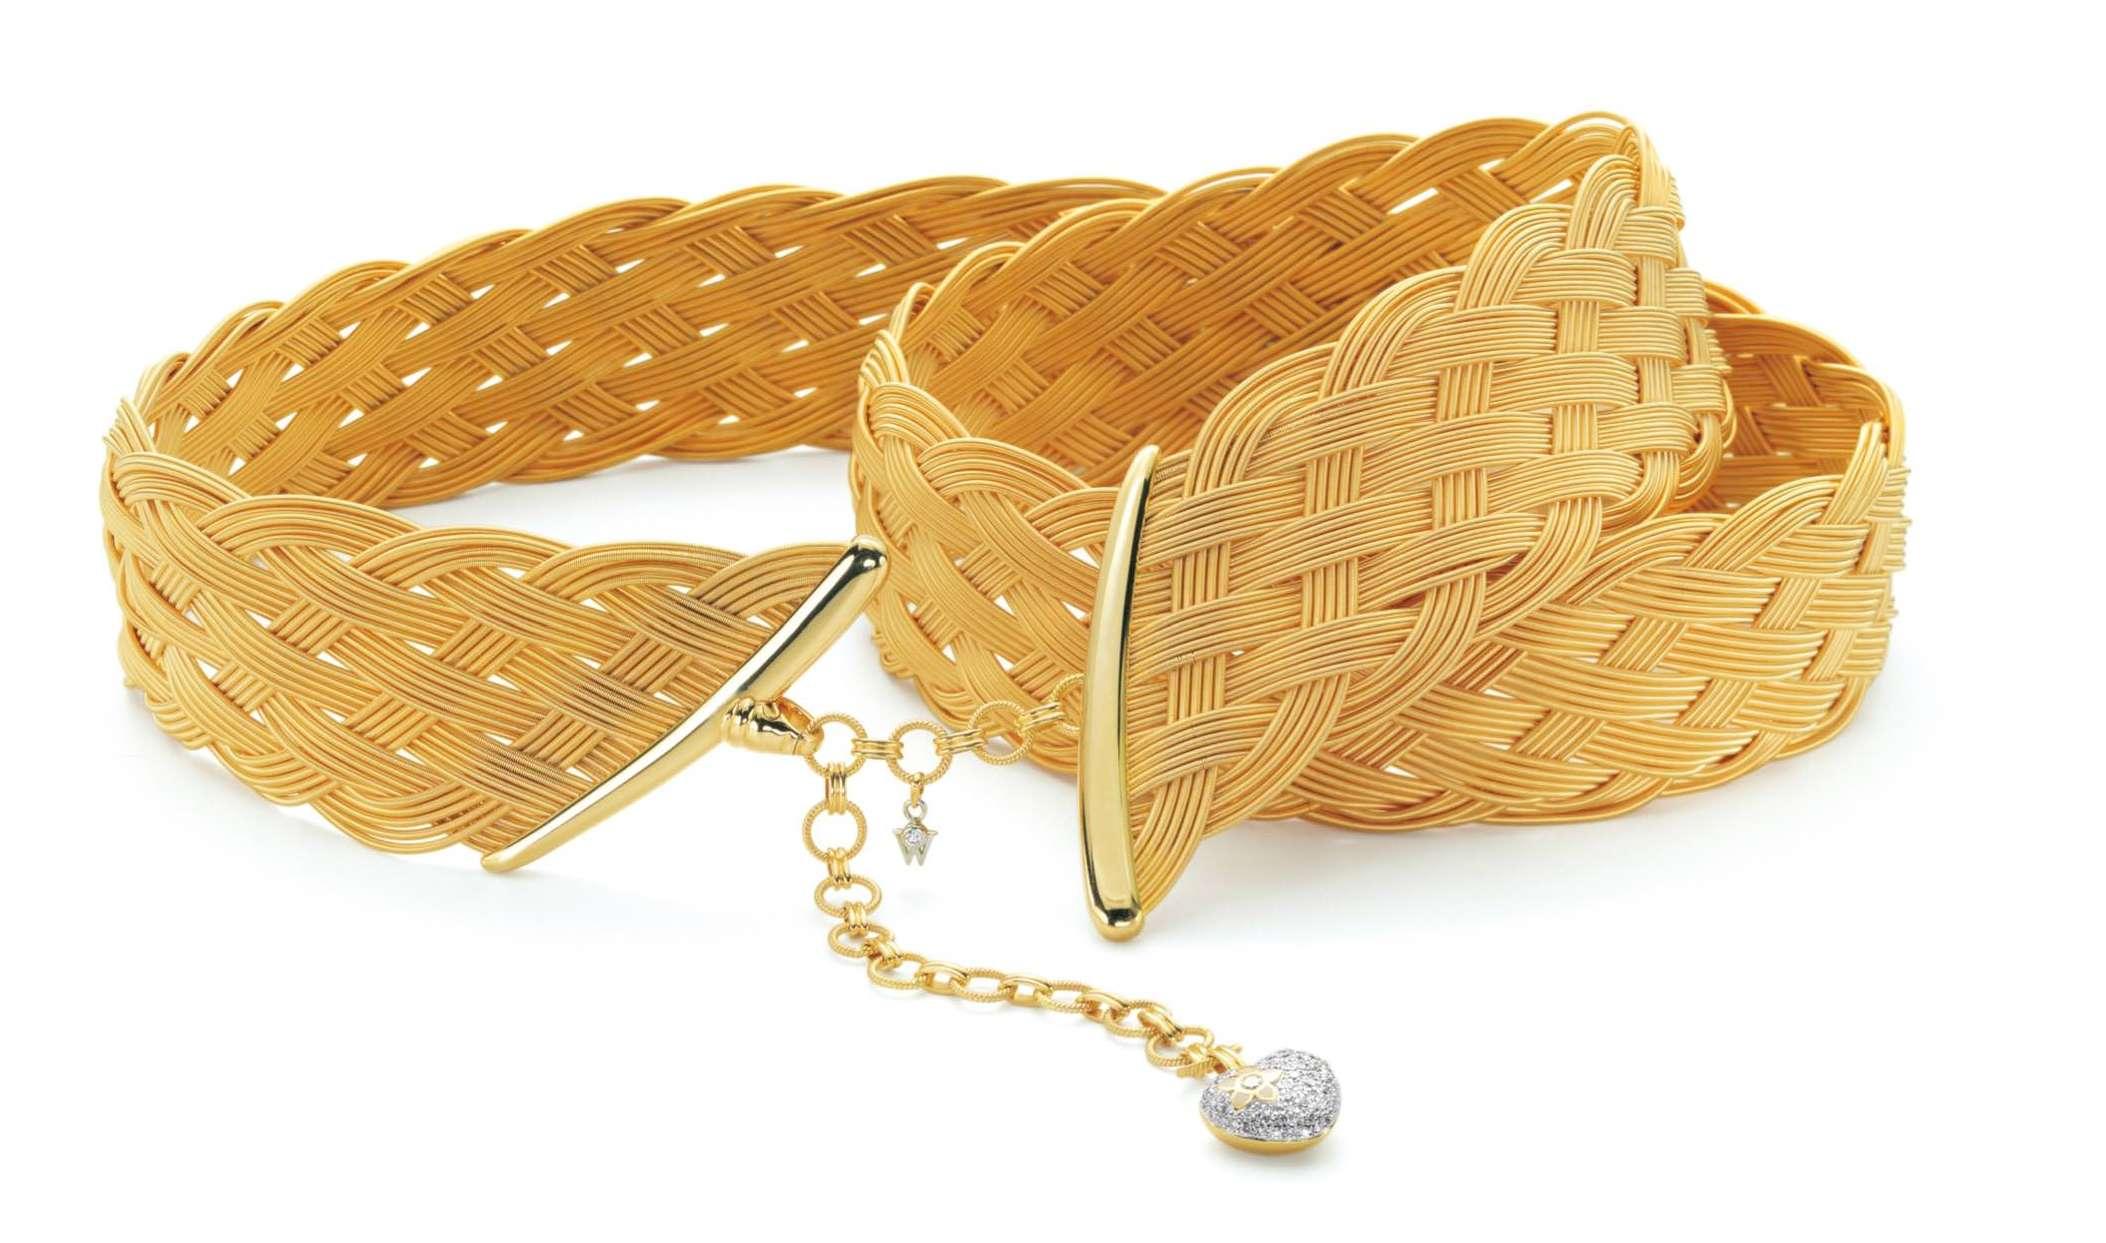 Wellendorff Golden Belt